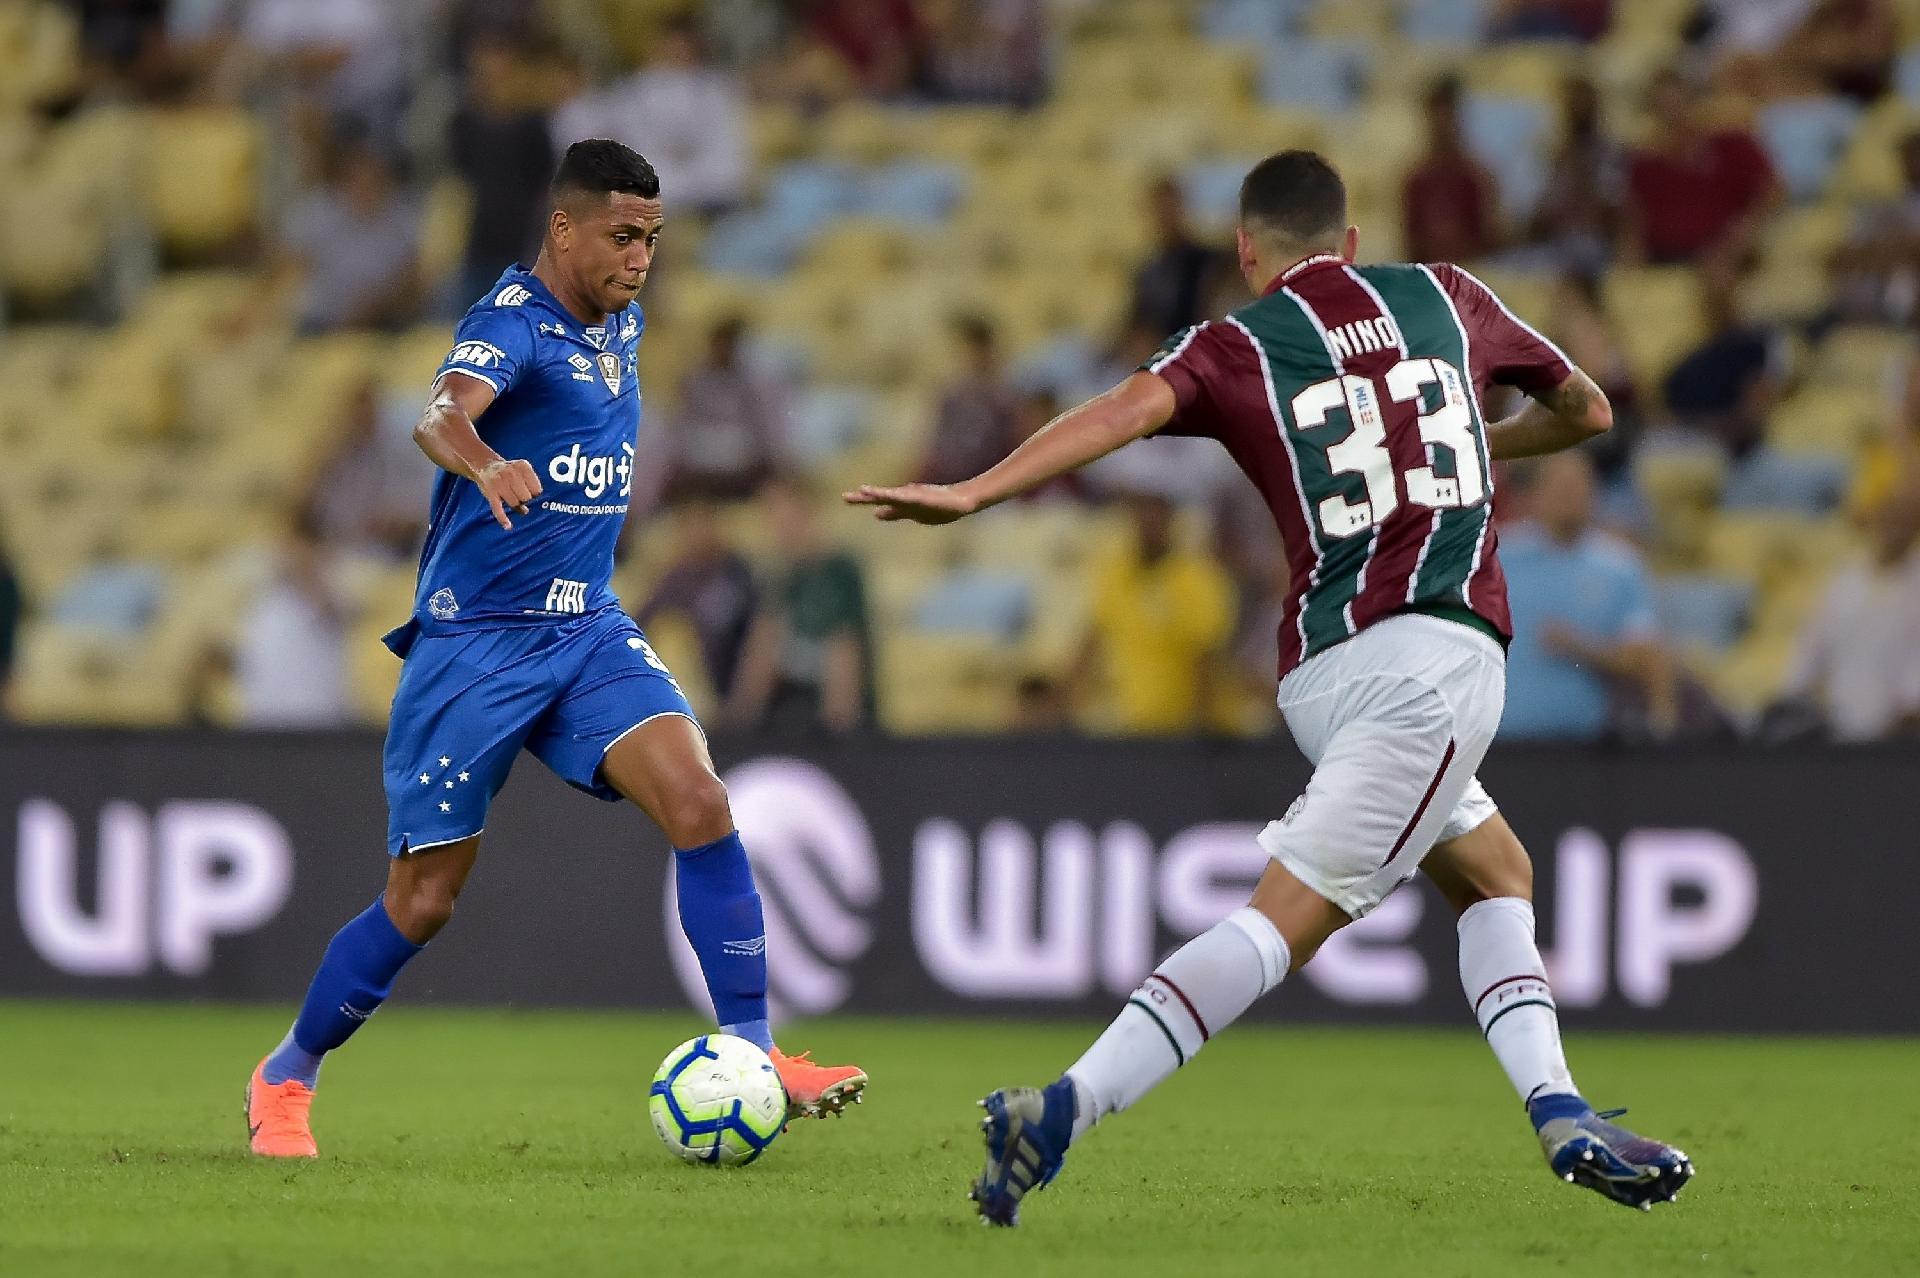 Cruzeiro-vs-Fluminense-Khach-lan-chu-07h30-ngay-10-10-Giai-VDQG-Brazil-Brazil-Serie-A-2